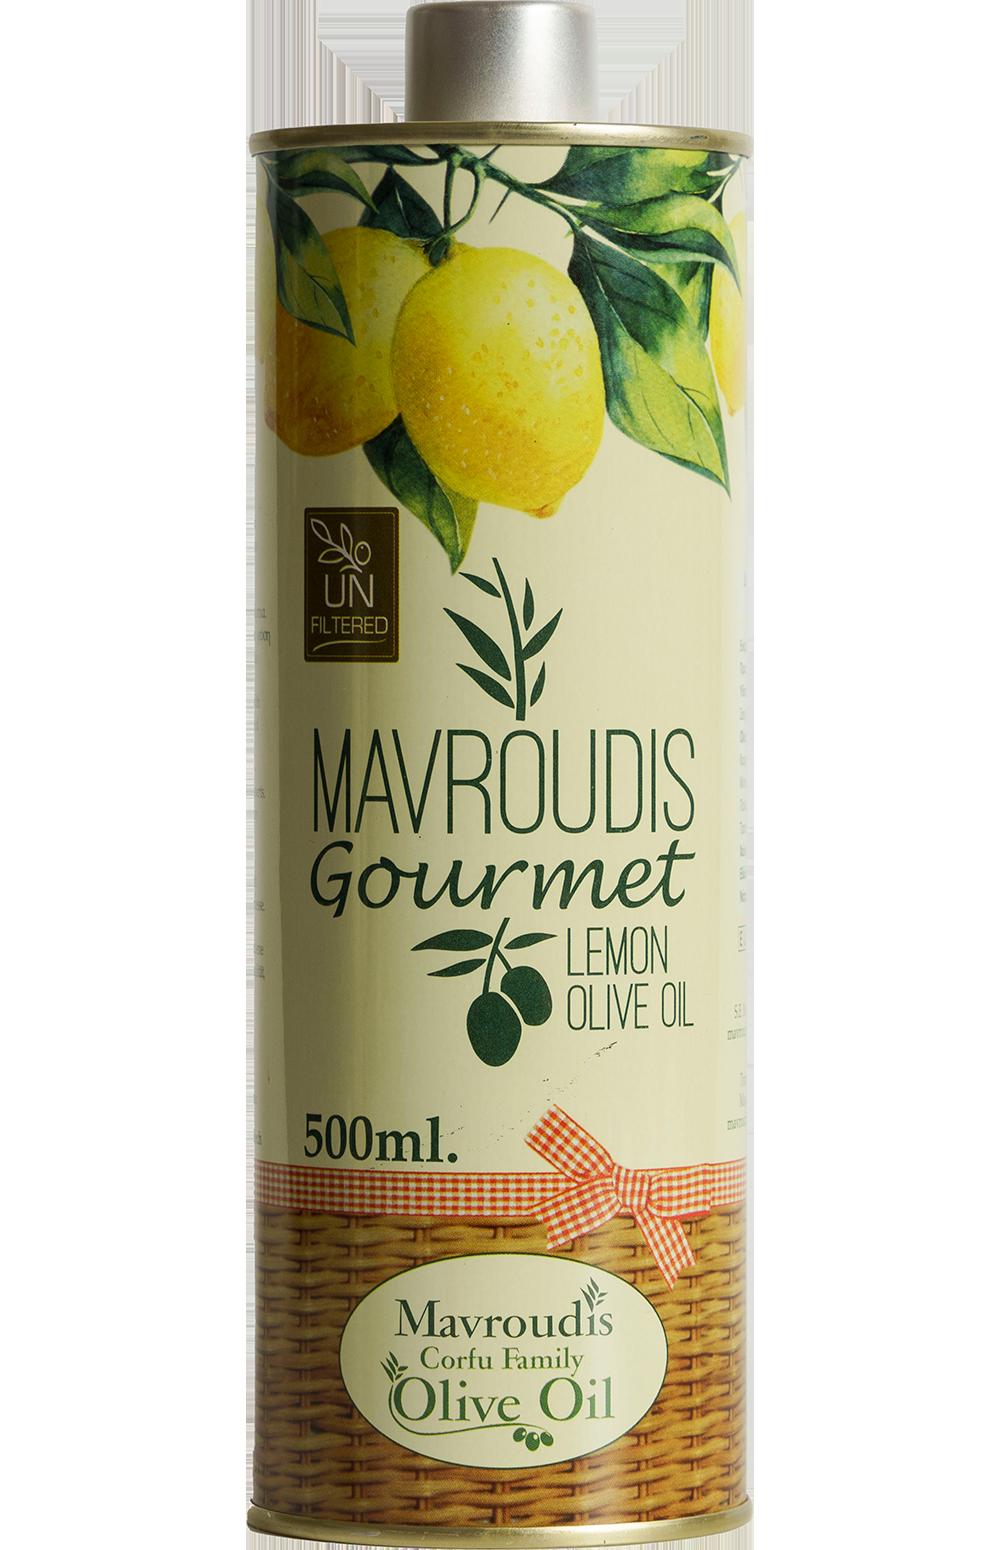 Mavroudis Gourmet Lemon